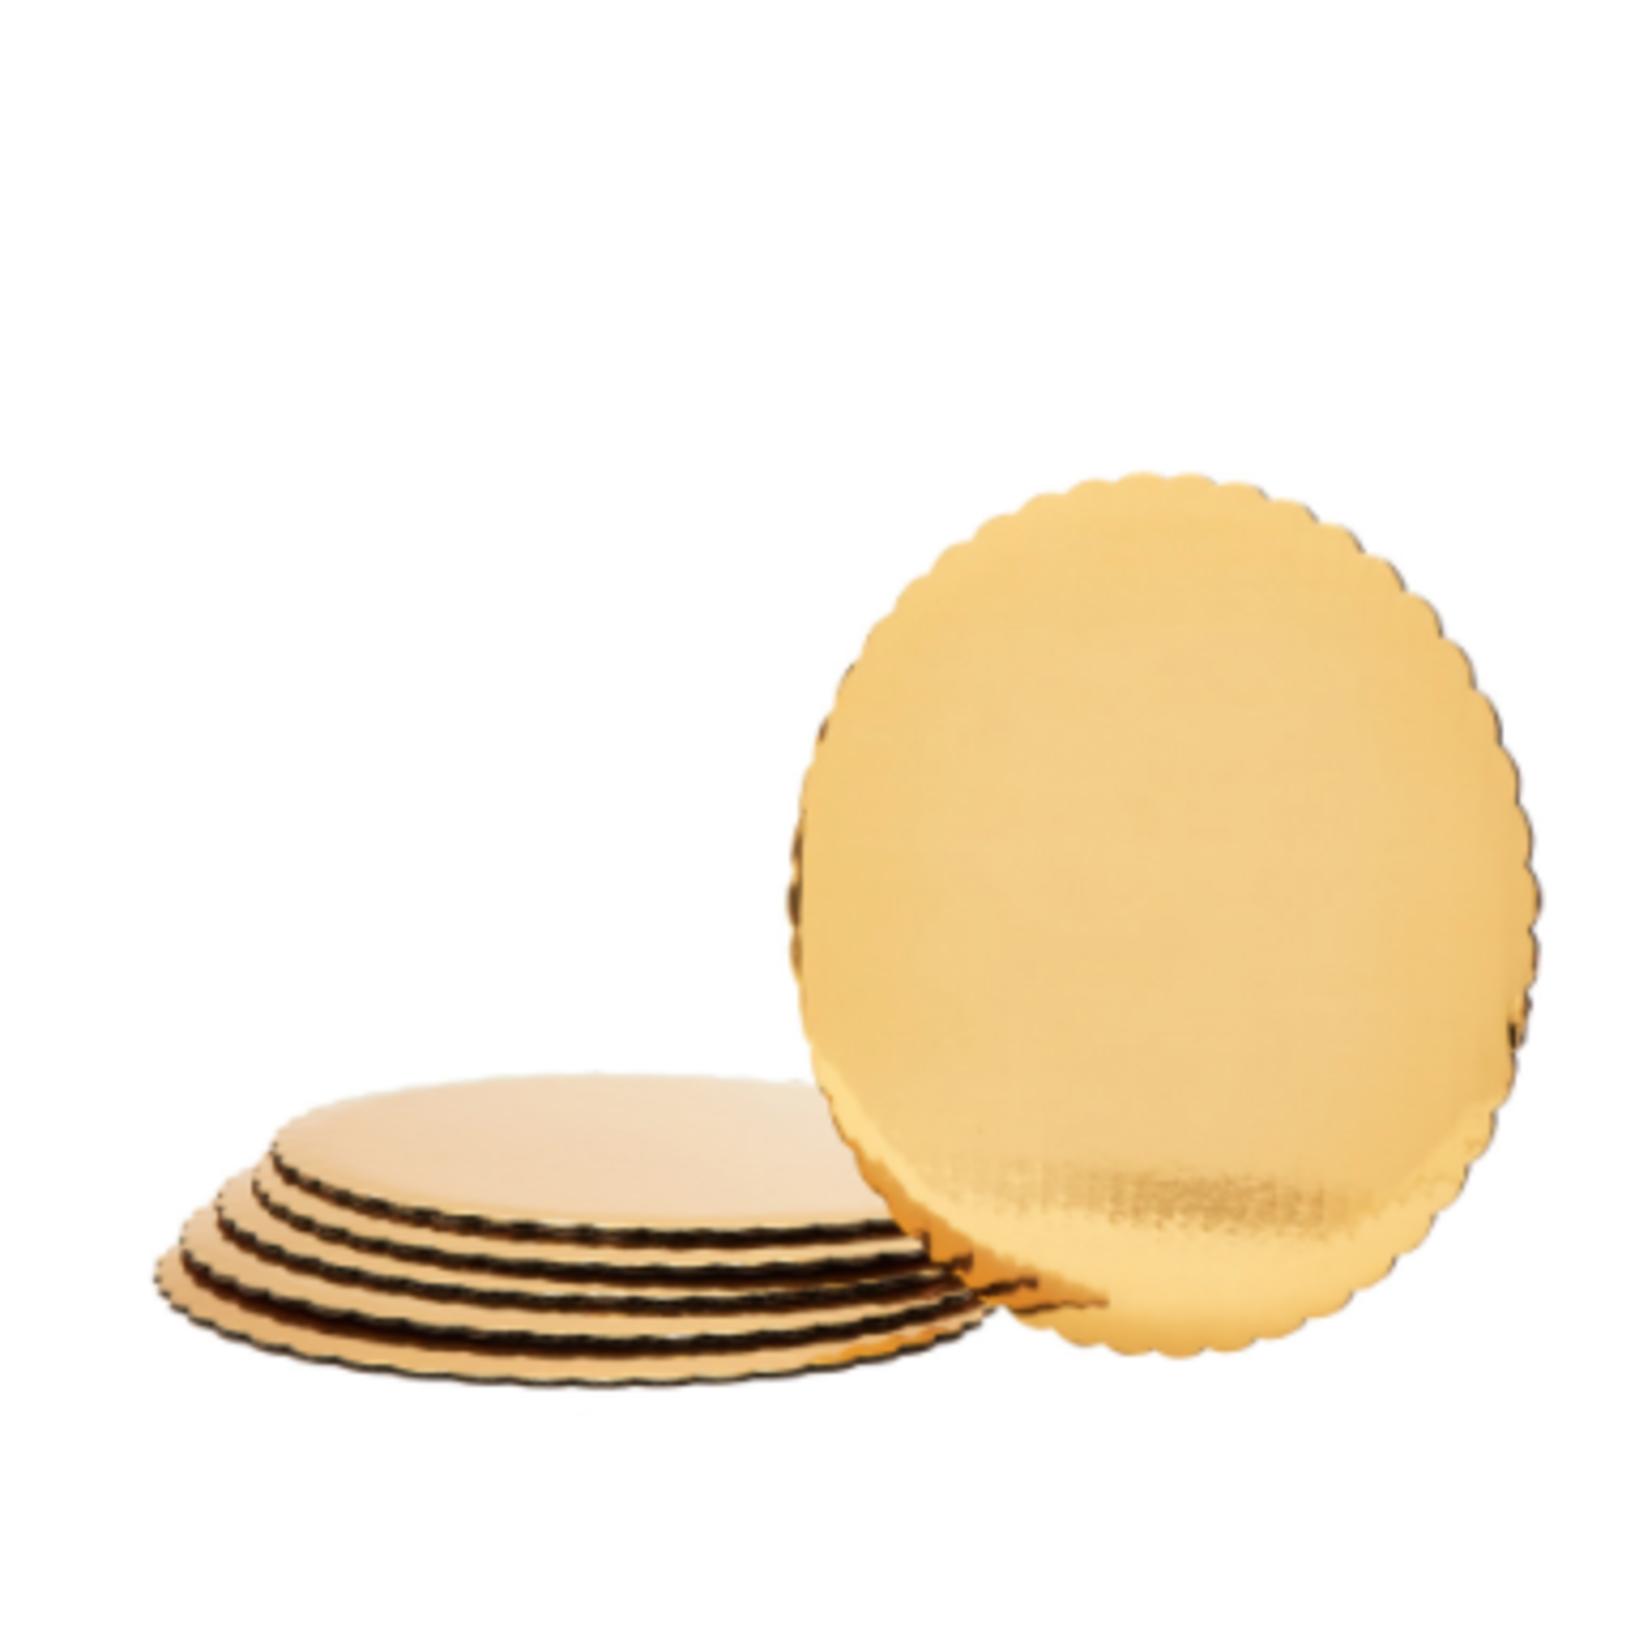 10'' GOLD FOIL COVERED CAKE BOARD- 6 PCS